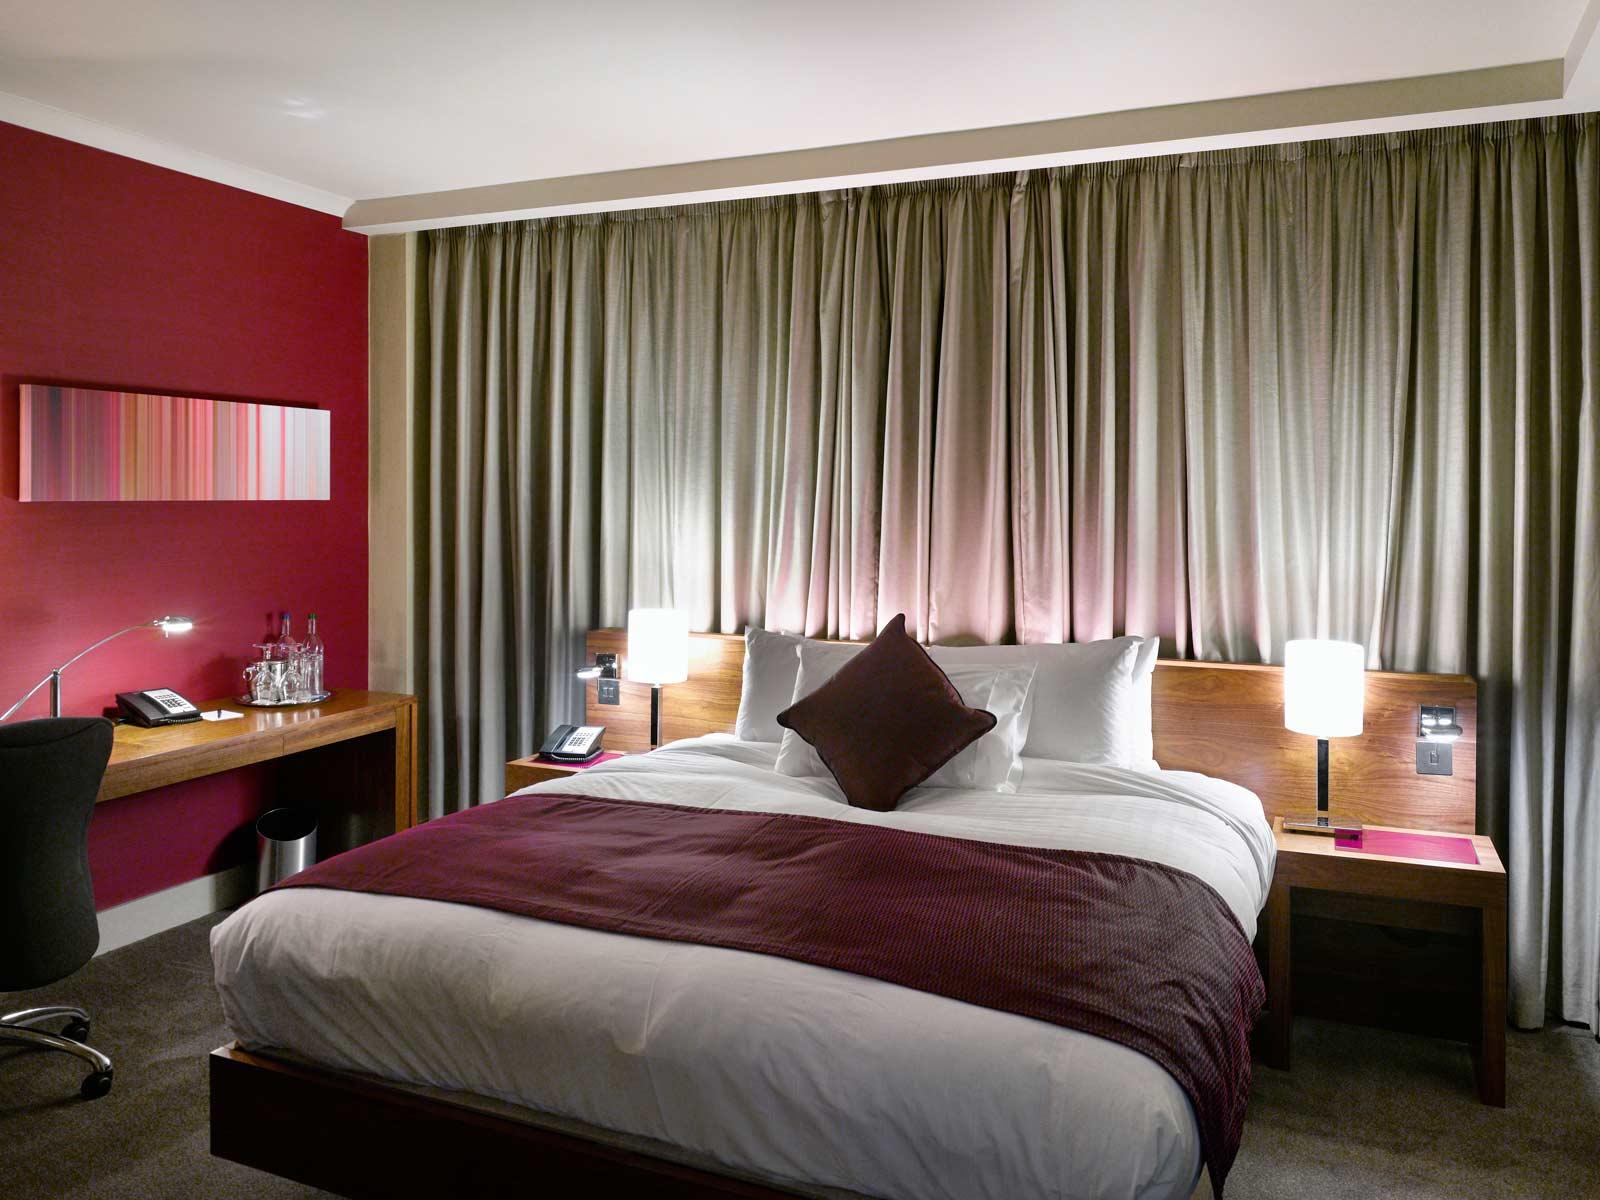 Hilton Hotel Liverpool Rooms Hilton Hotel in Liverpool